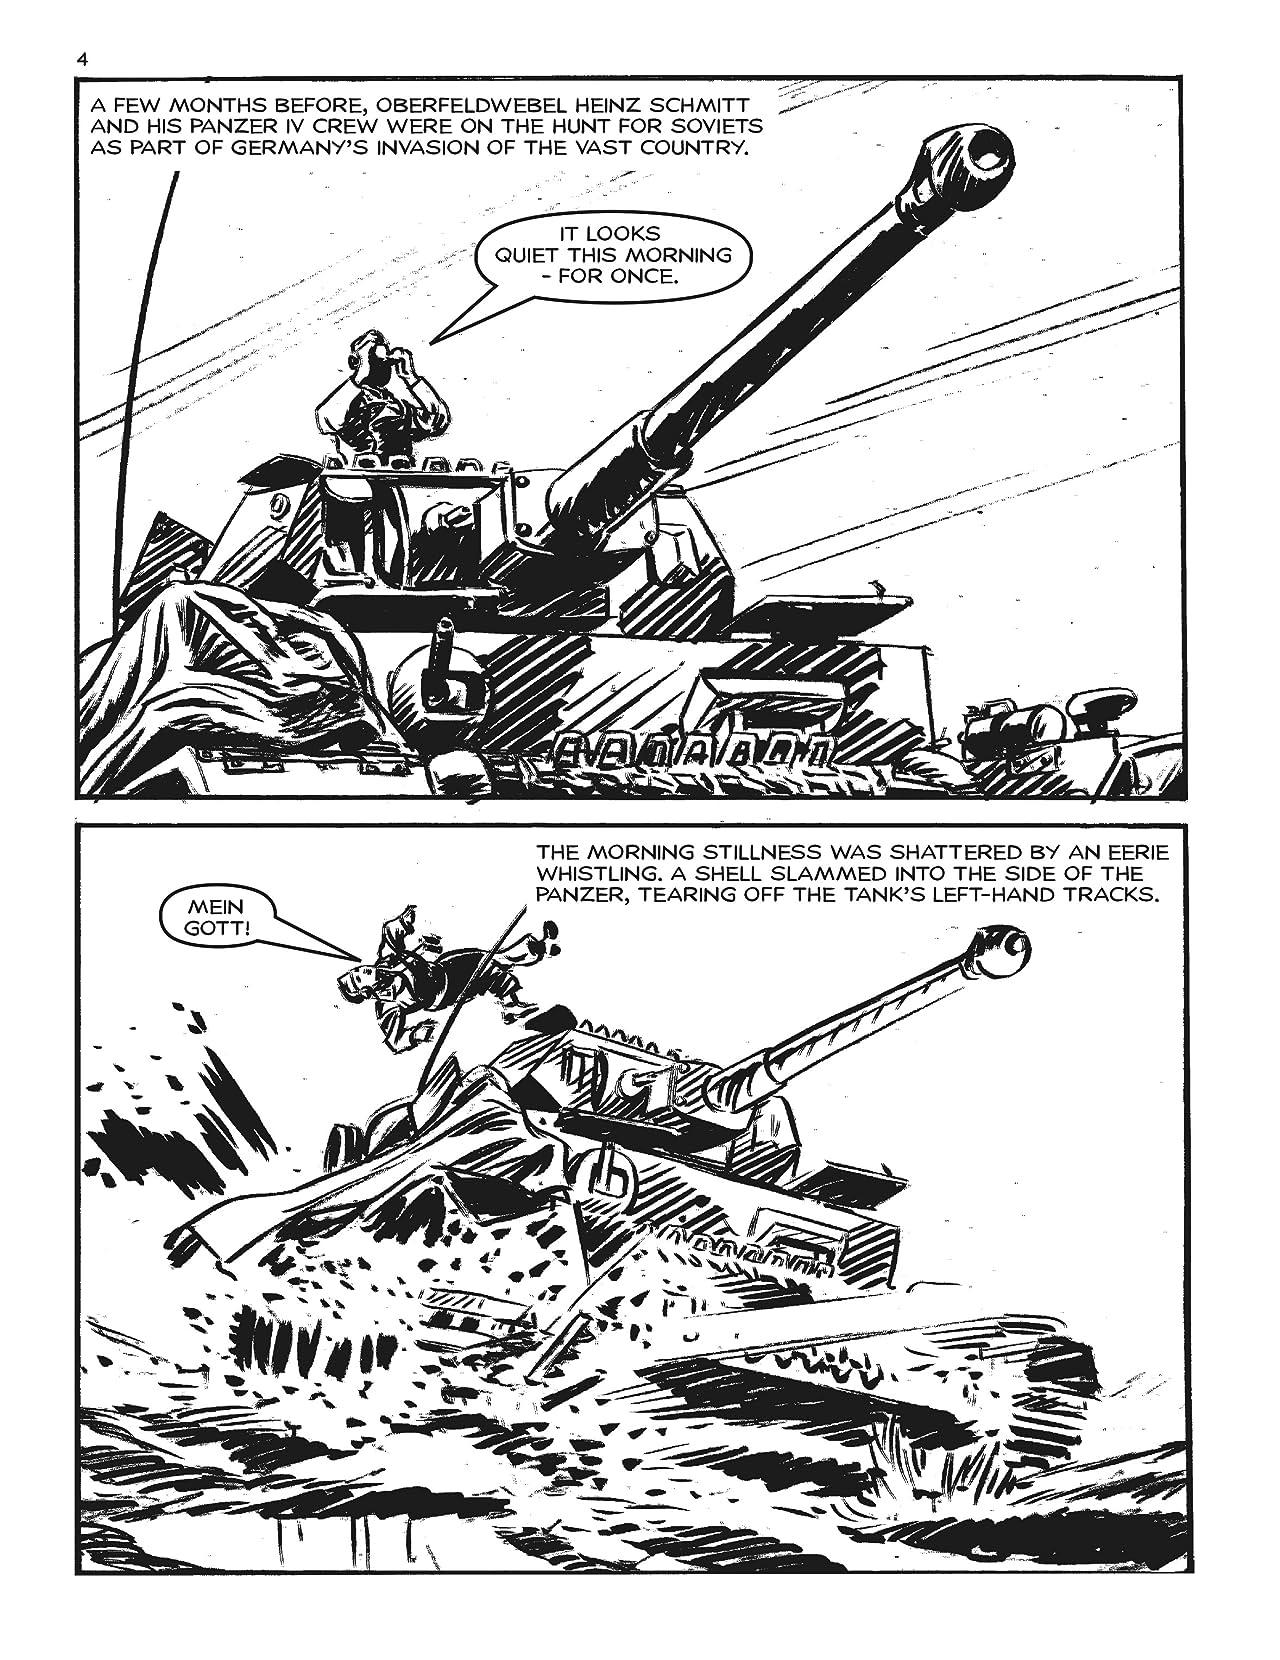 Commando #5017: The Elefant